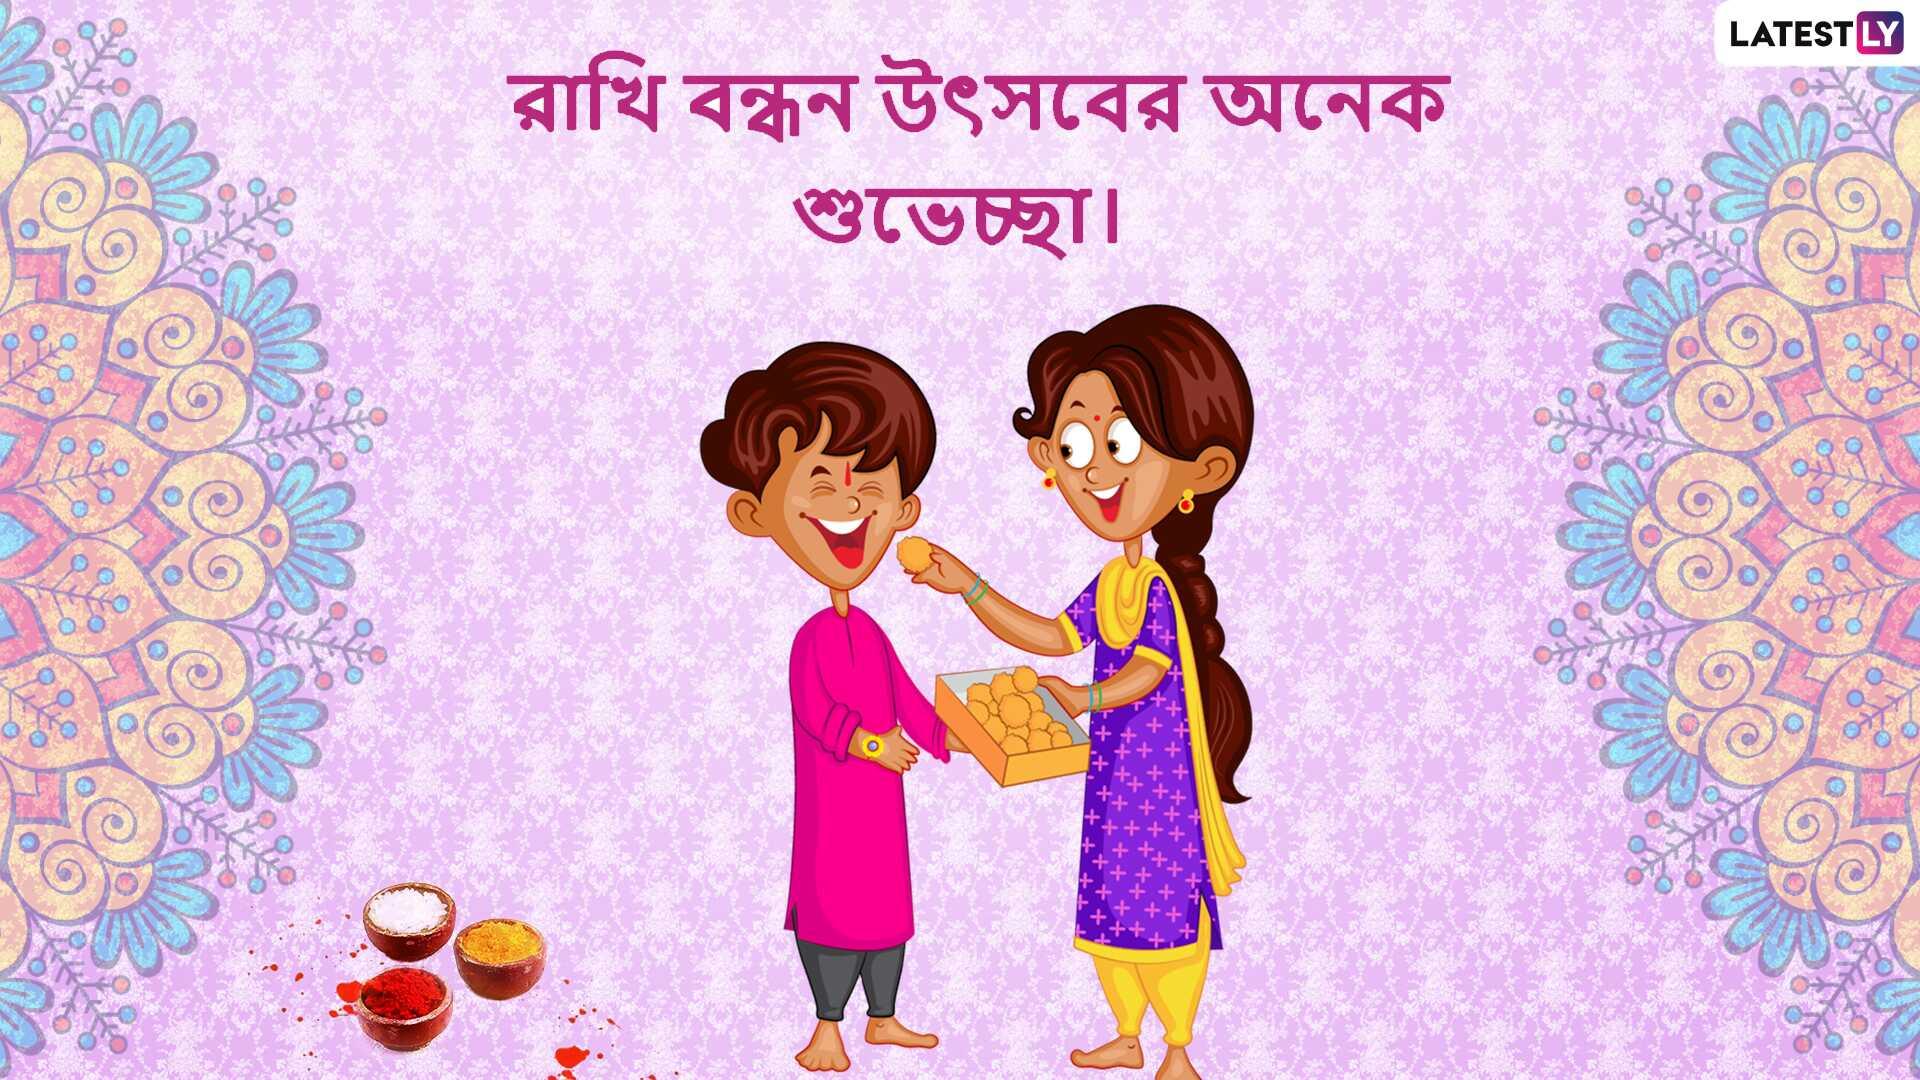 Raksha Bandhan 2021 Wishes: রাখি বন্ধন উৎসবে বাড়িতে বসেই  ভাই বোনেদের facebook, Whatsapp- এ শেয়ার করুন এই শুভেচ্ছা বার্তা